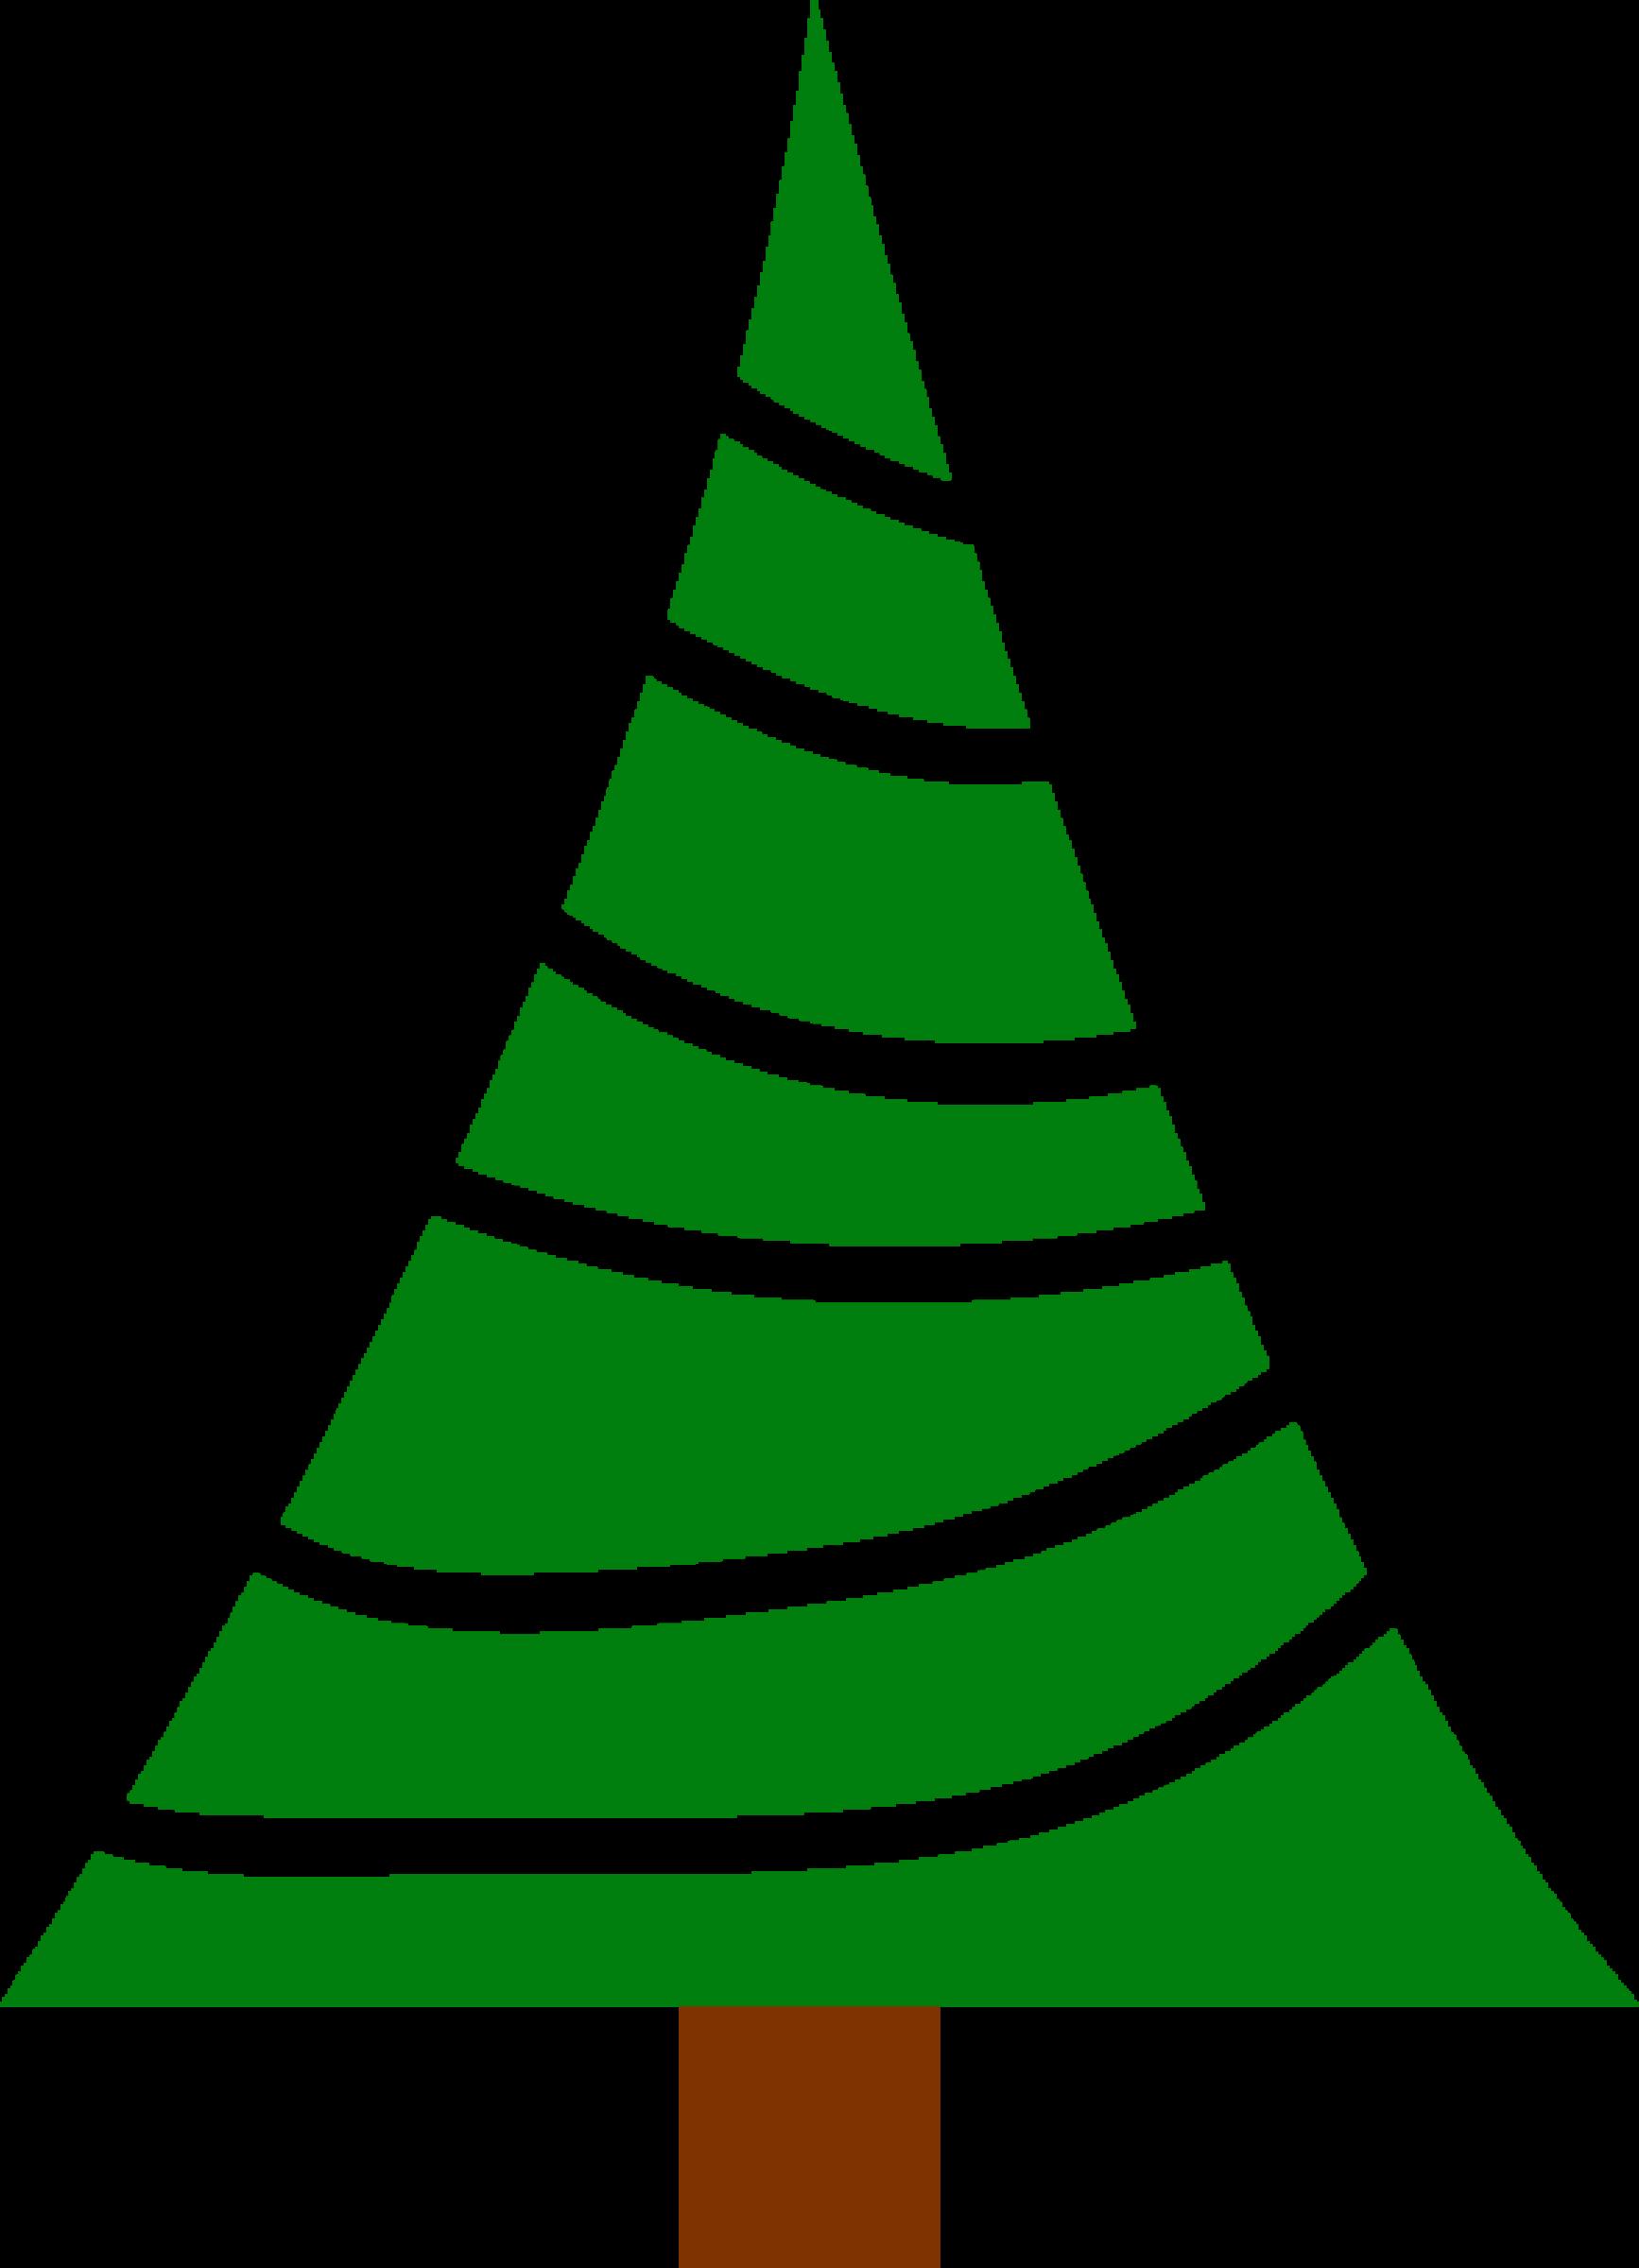 Christmas tree big image. December clipart simple